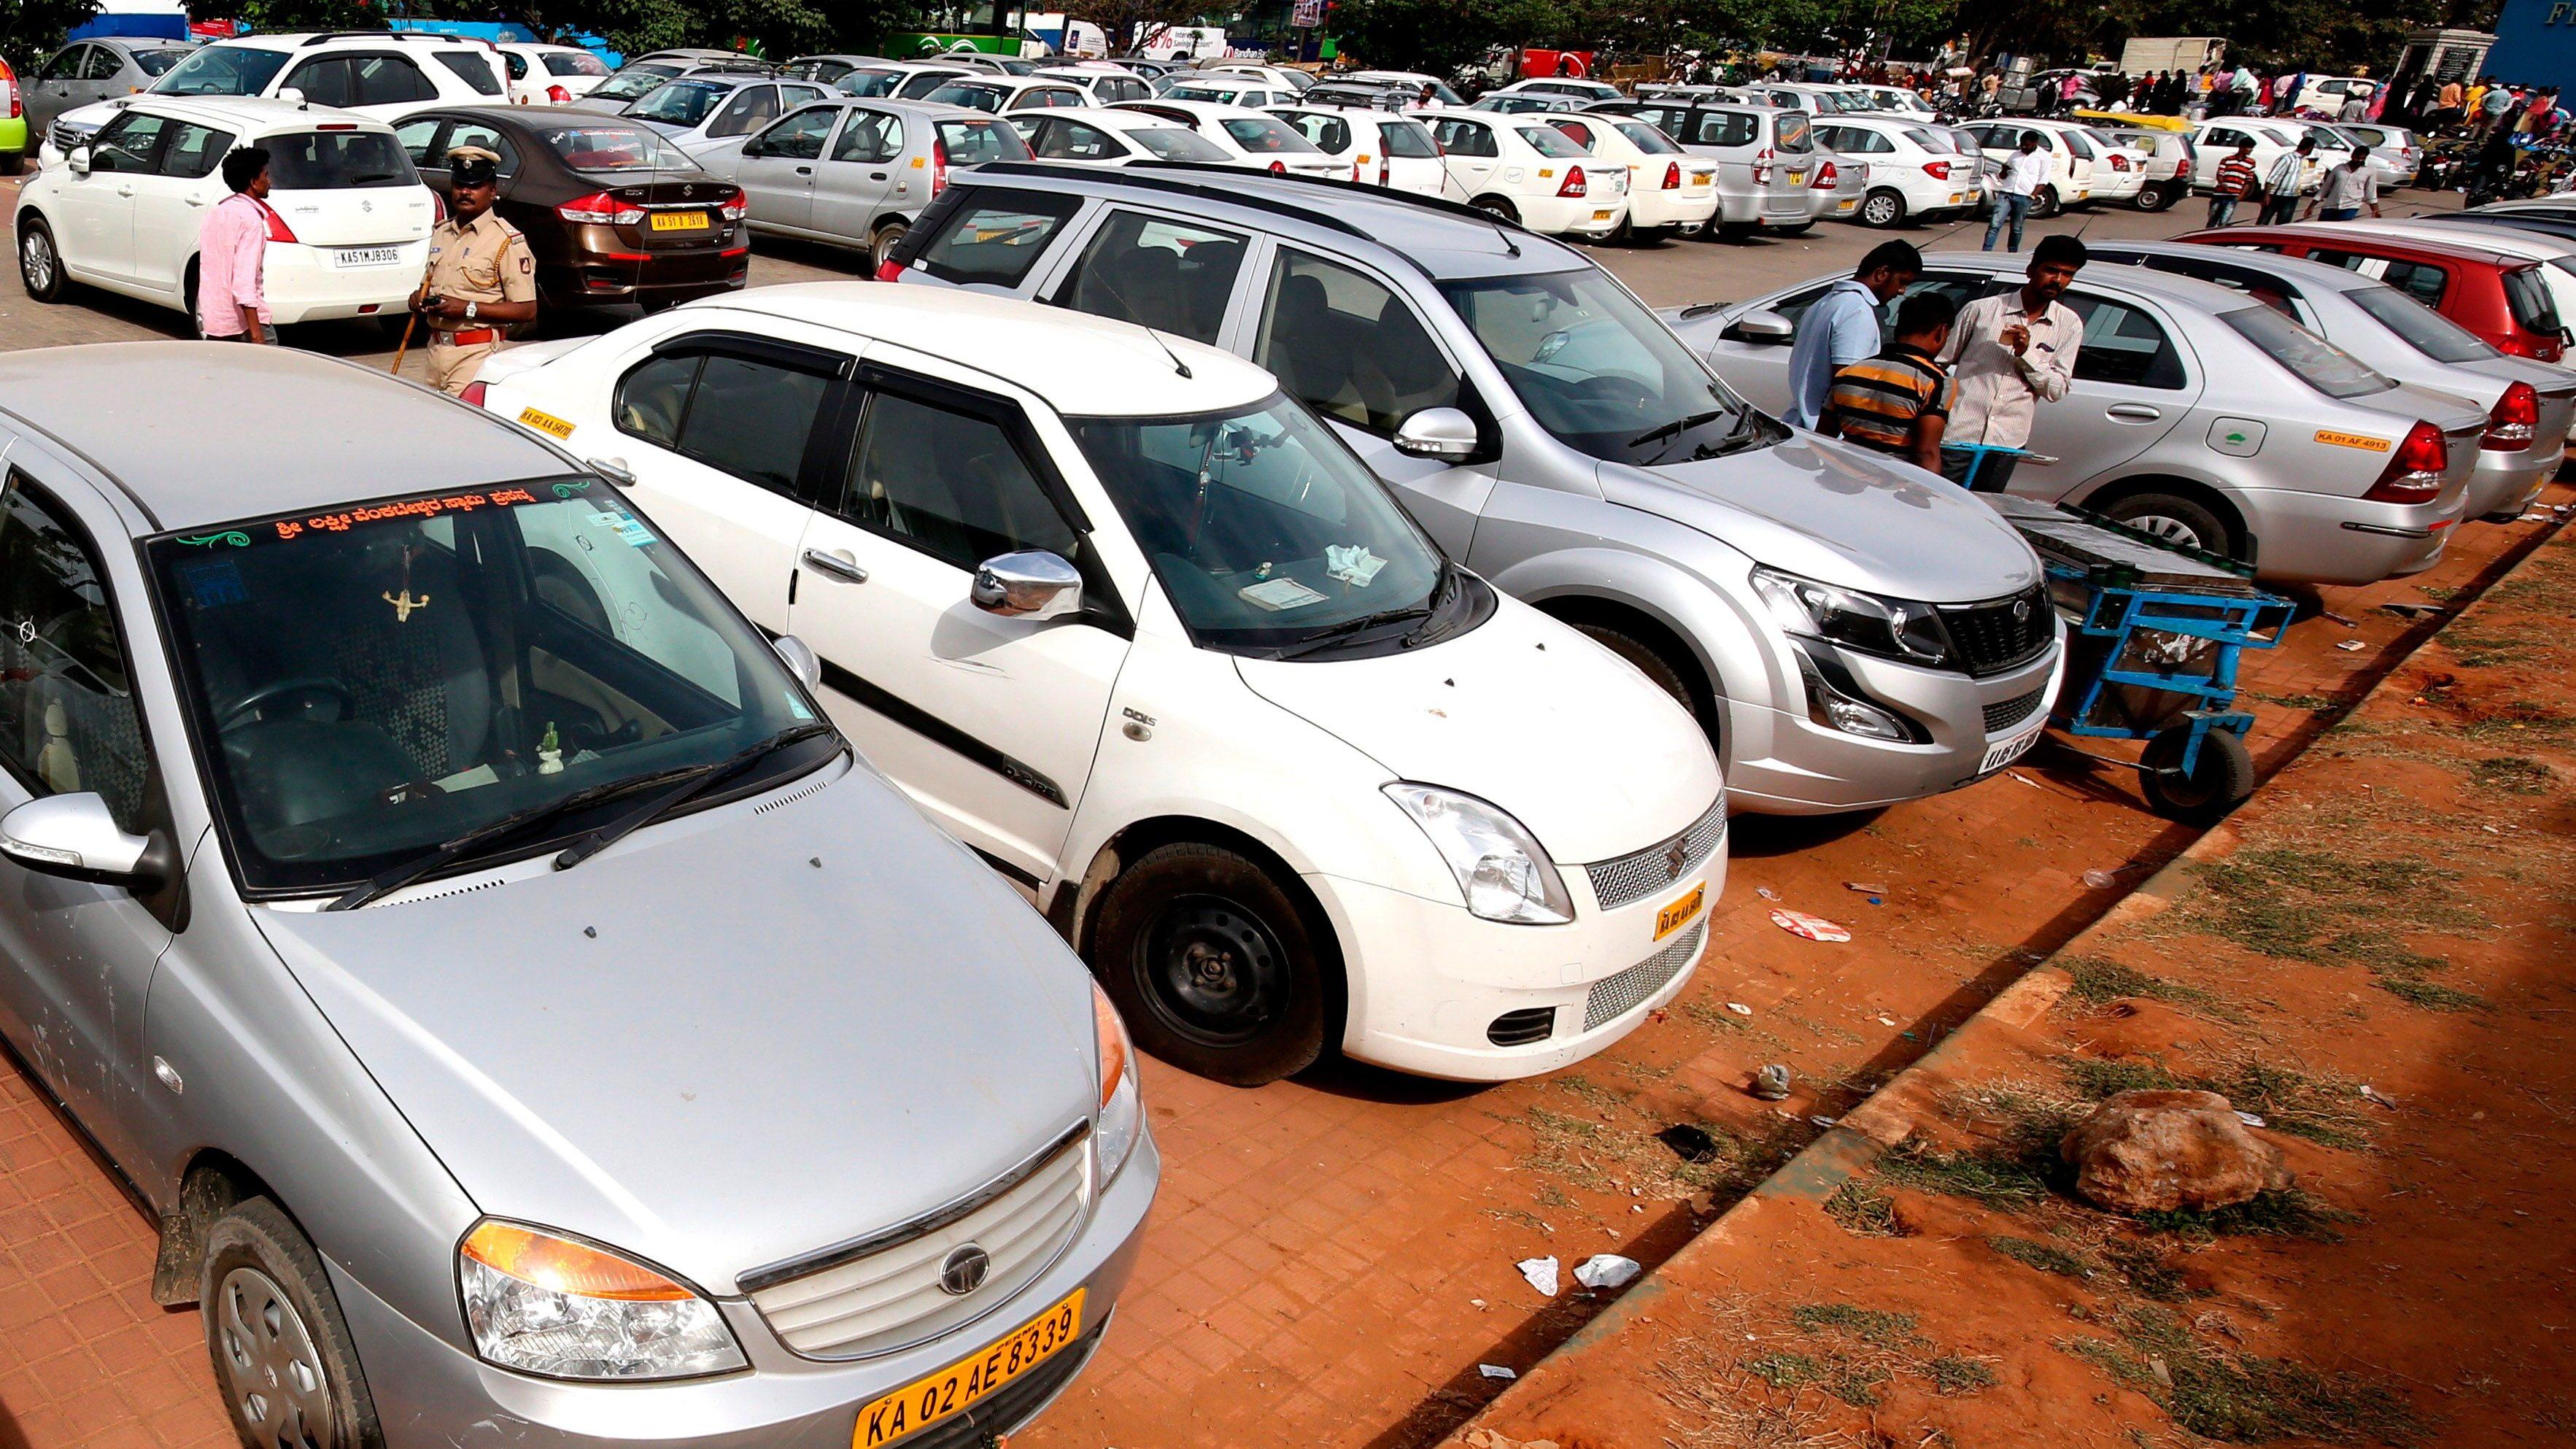 Ola and Uber drivers go on strike in Bangalore, India - 02 Mar 2017